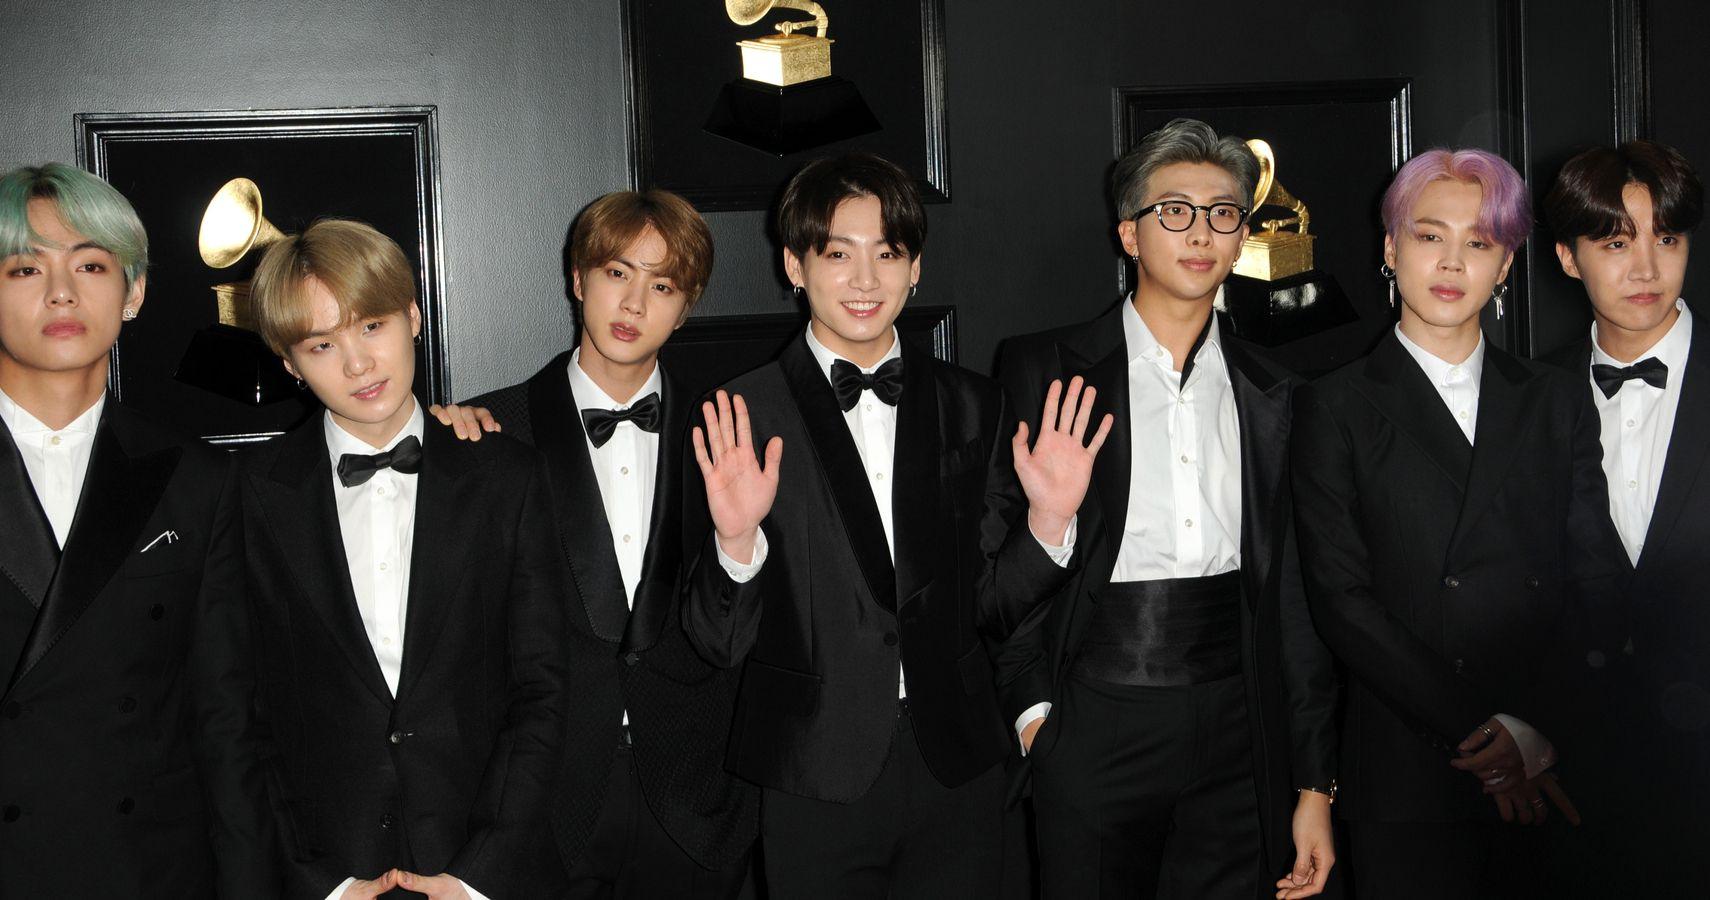 BTS' UN Campaign Nets Millions Of Dollars And Breaks Social Media